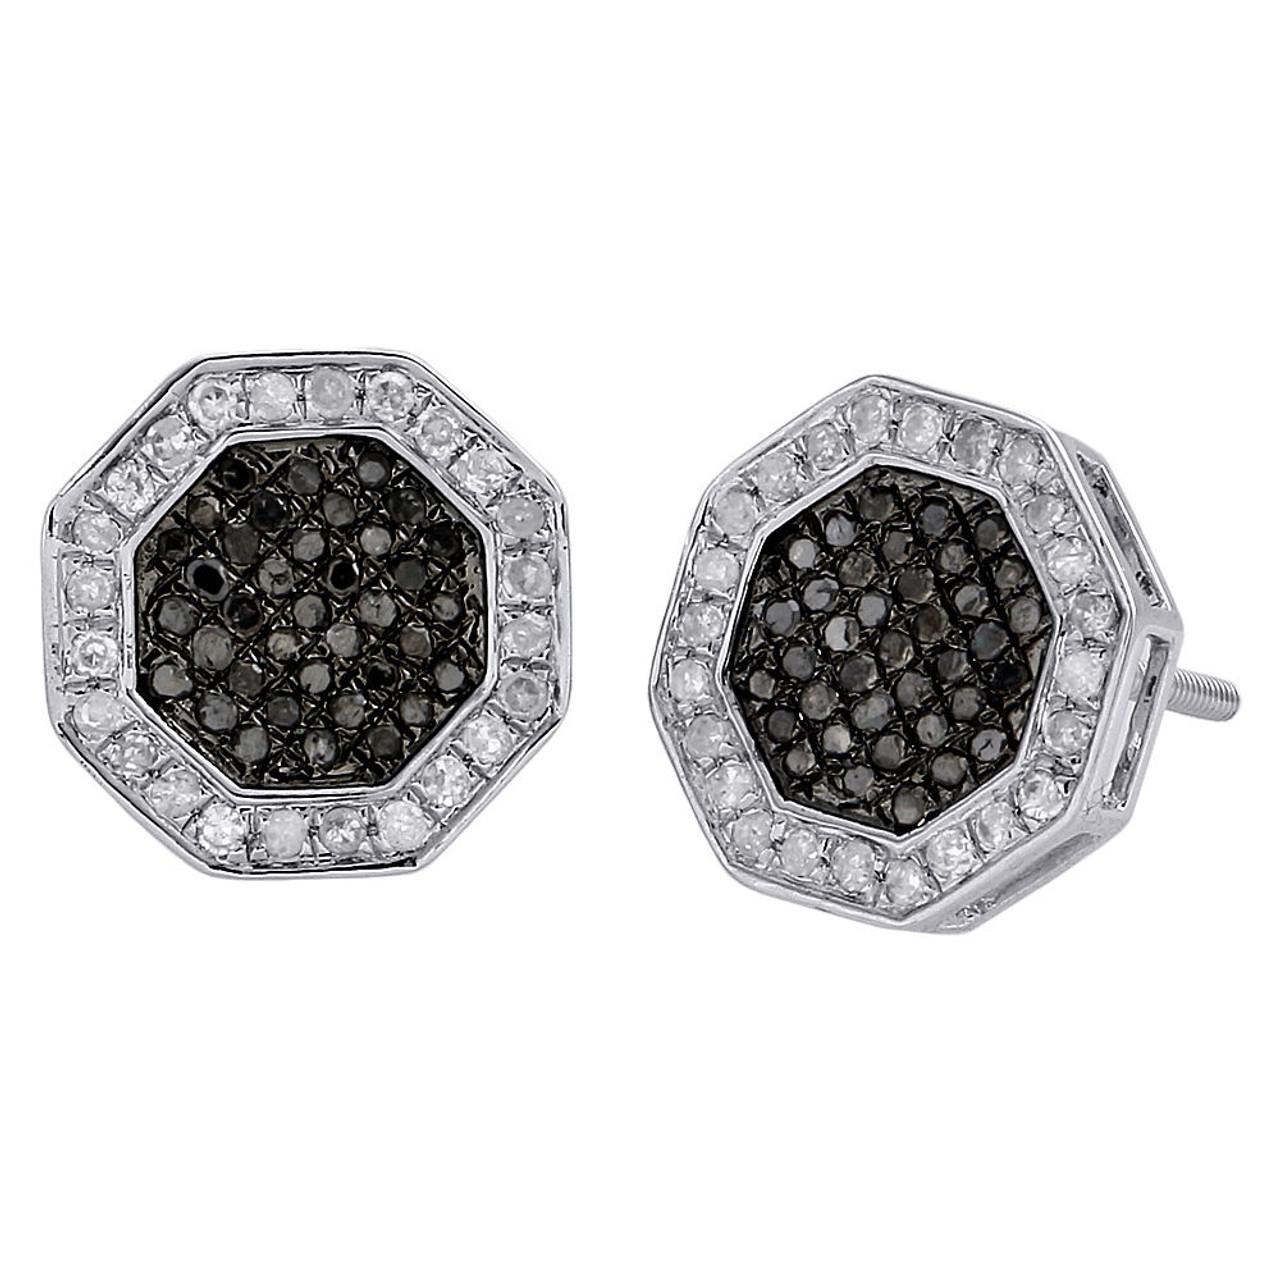 10k White Gold Round Black Diamond Octagon Shape Studs Pave Earrings 1 2 Ct Jfl Diamonds Timepieces